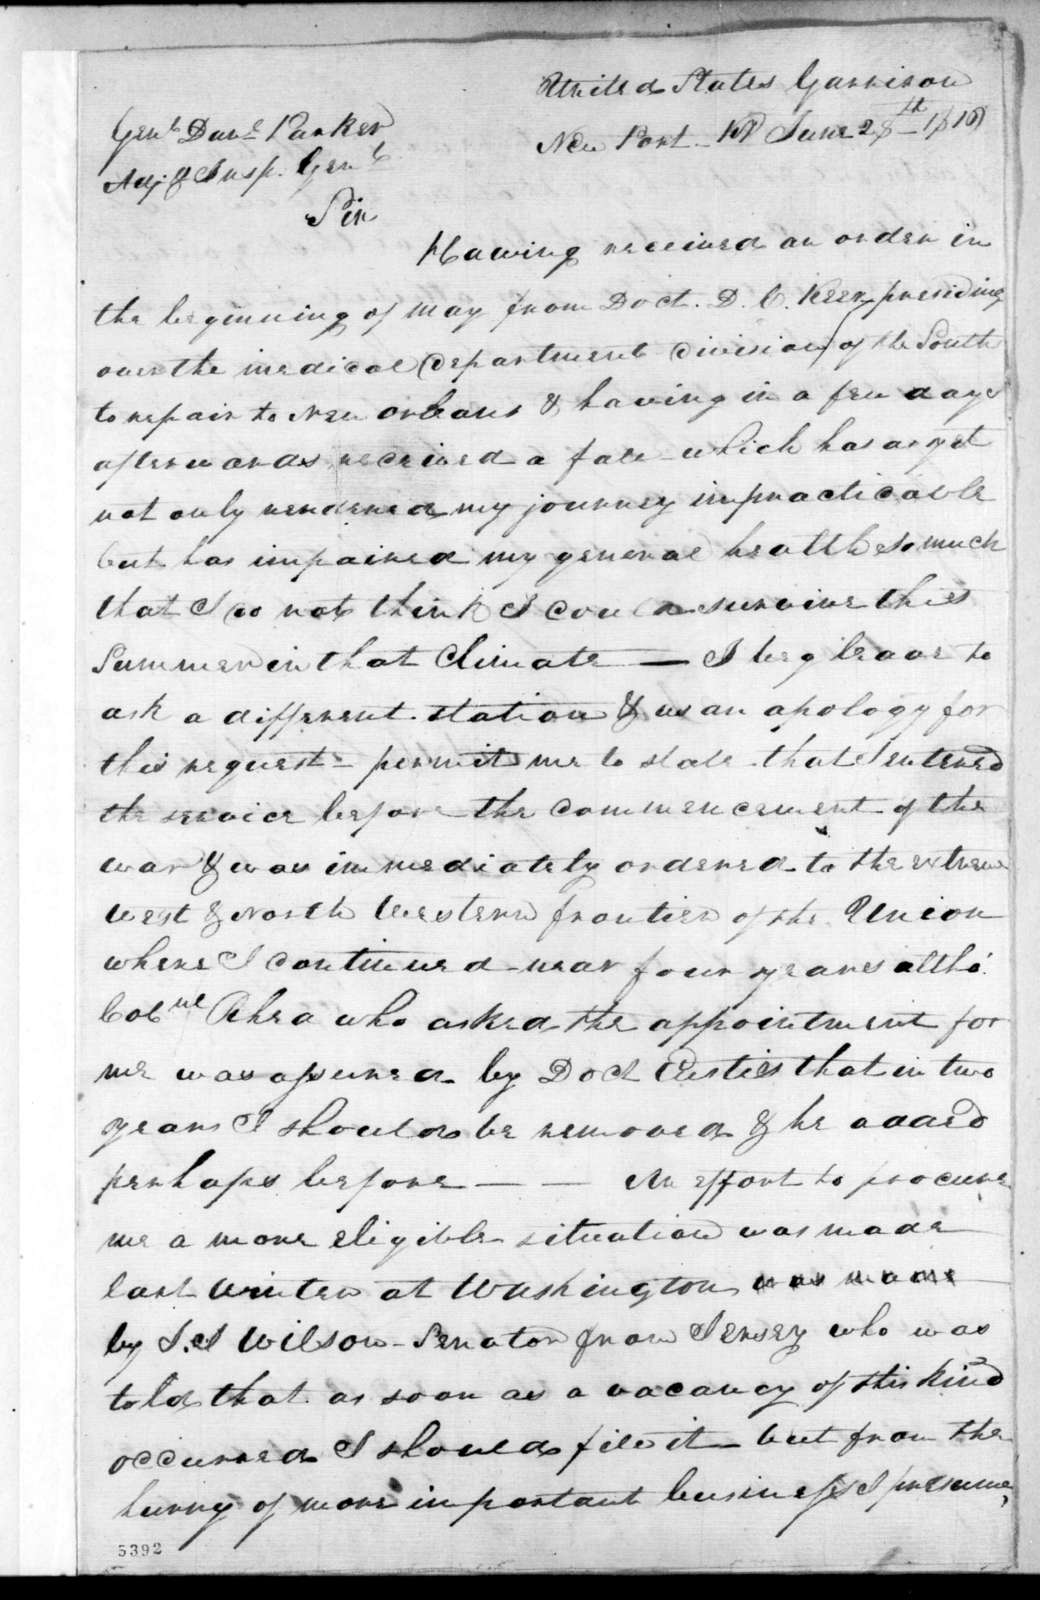 Jonathan S. Cool to Daniel Parker, June 28, 1816